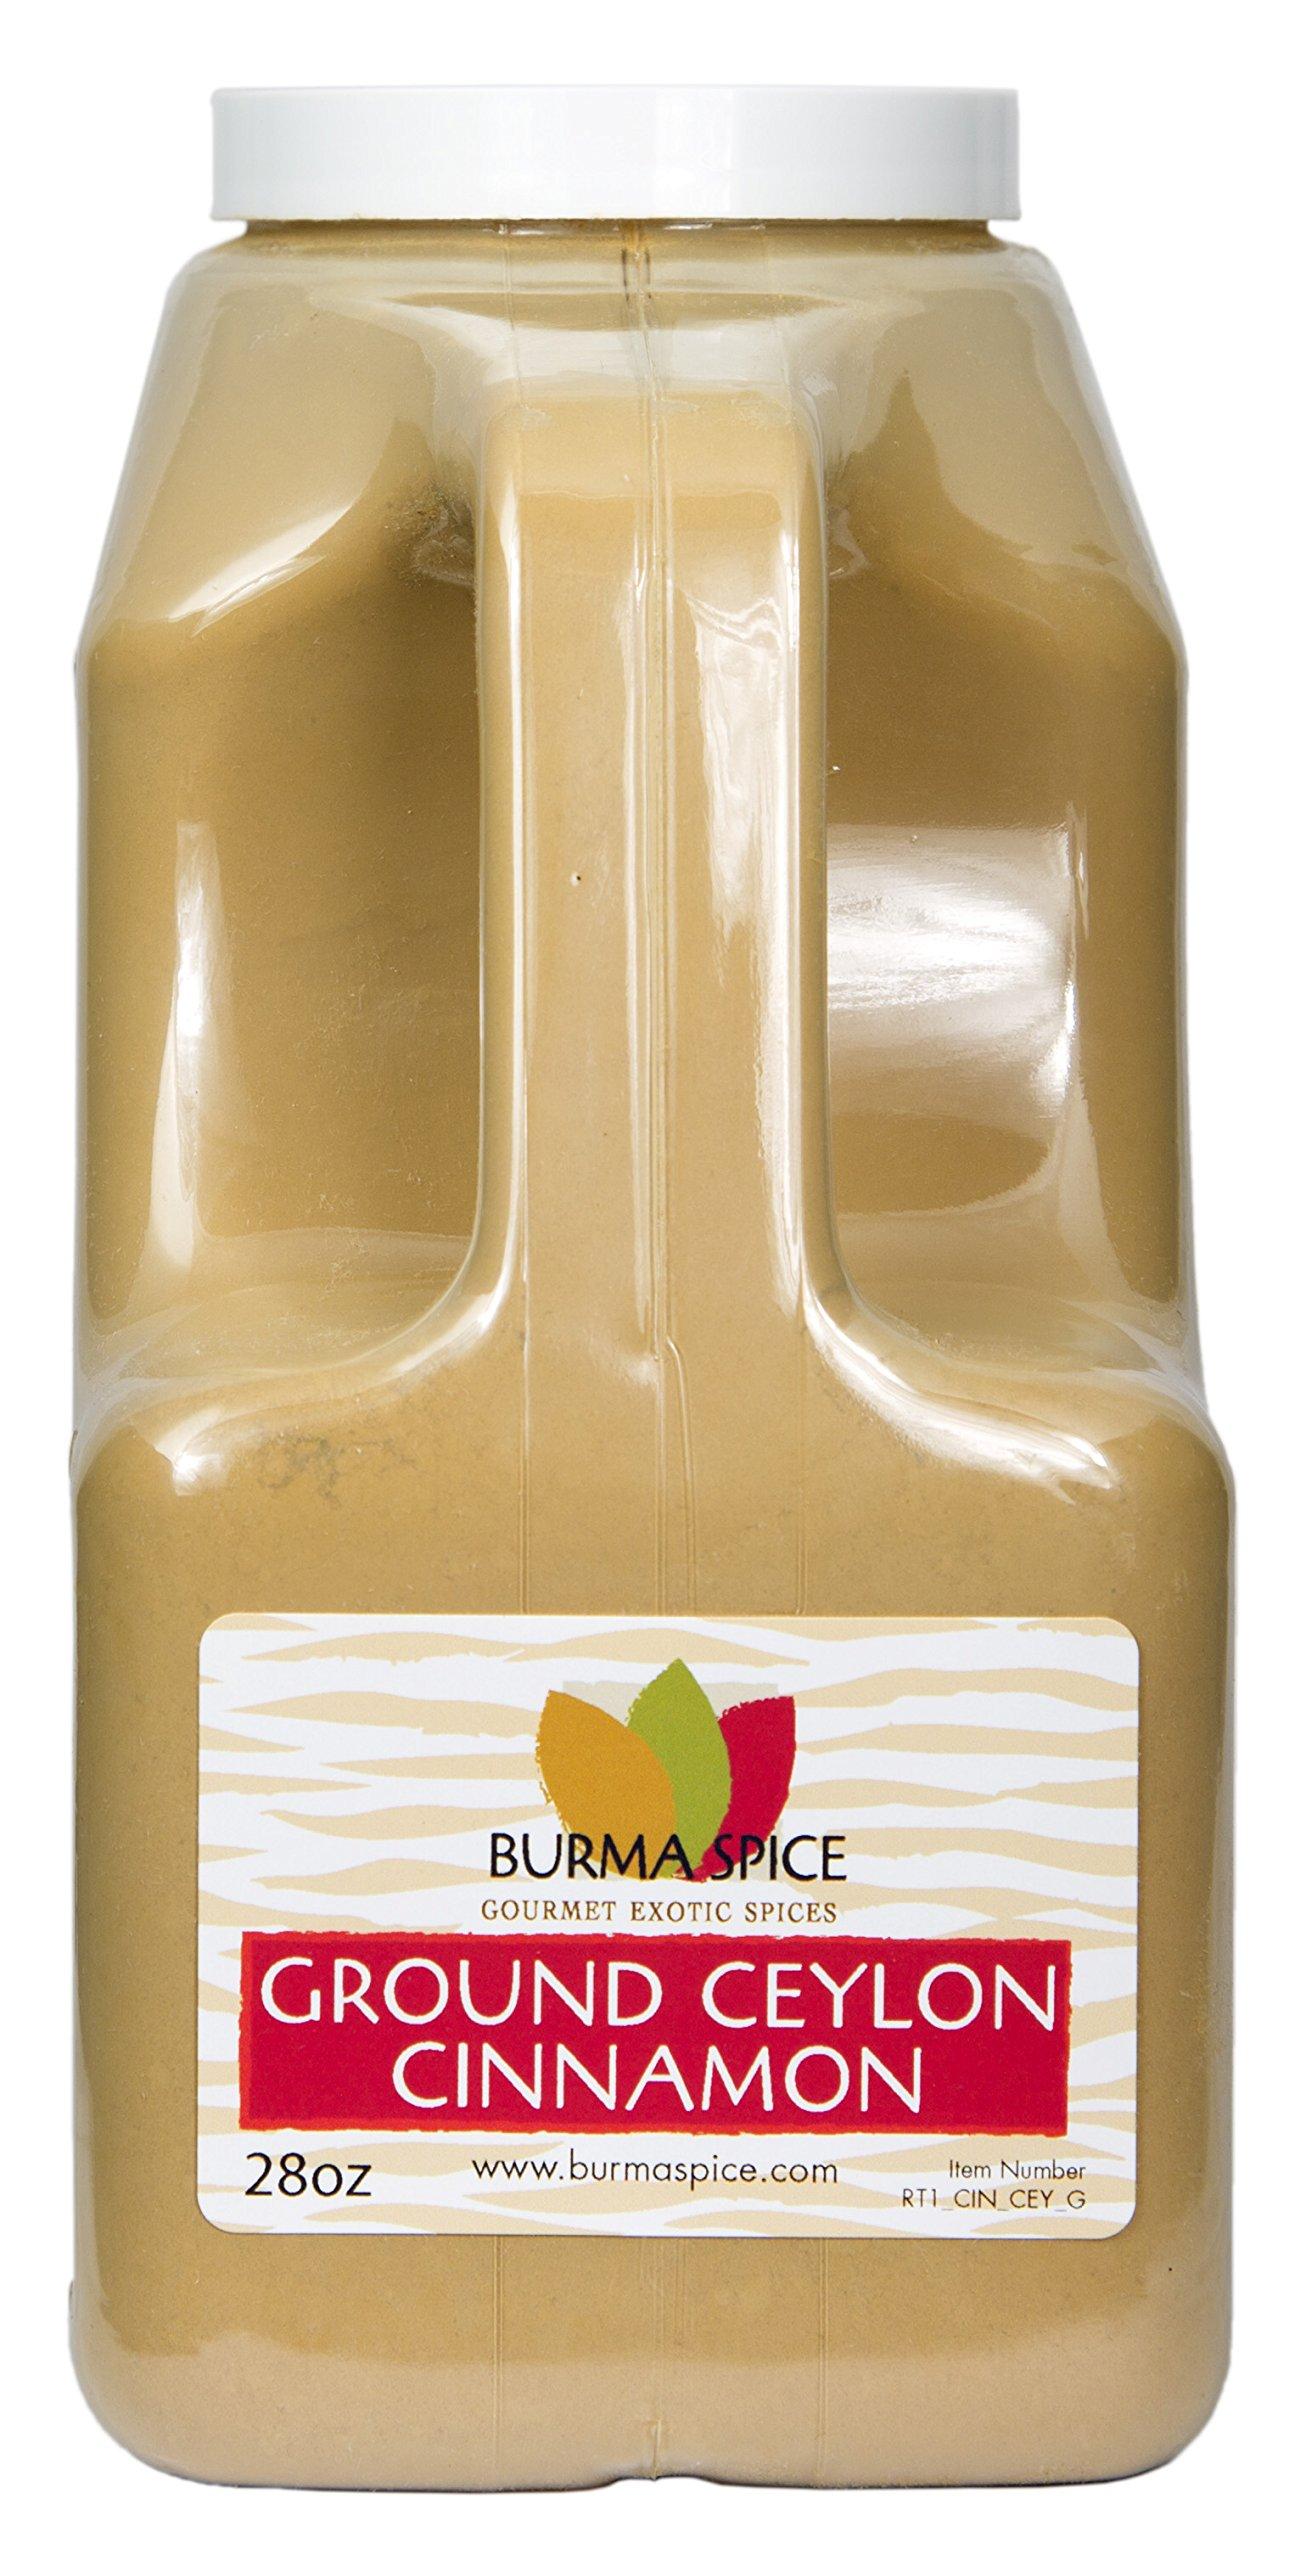 Ground Ceylon Cinnamon | Very freshly ground | Highest Premium Grade | 100% Pure with no additives | Kosher Certified (28oz) by Burma Spice (Image #1)